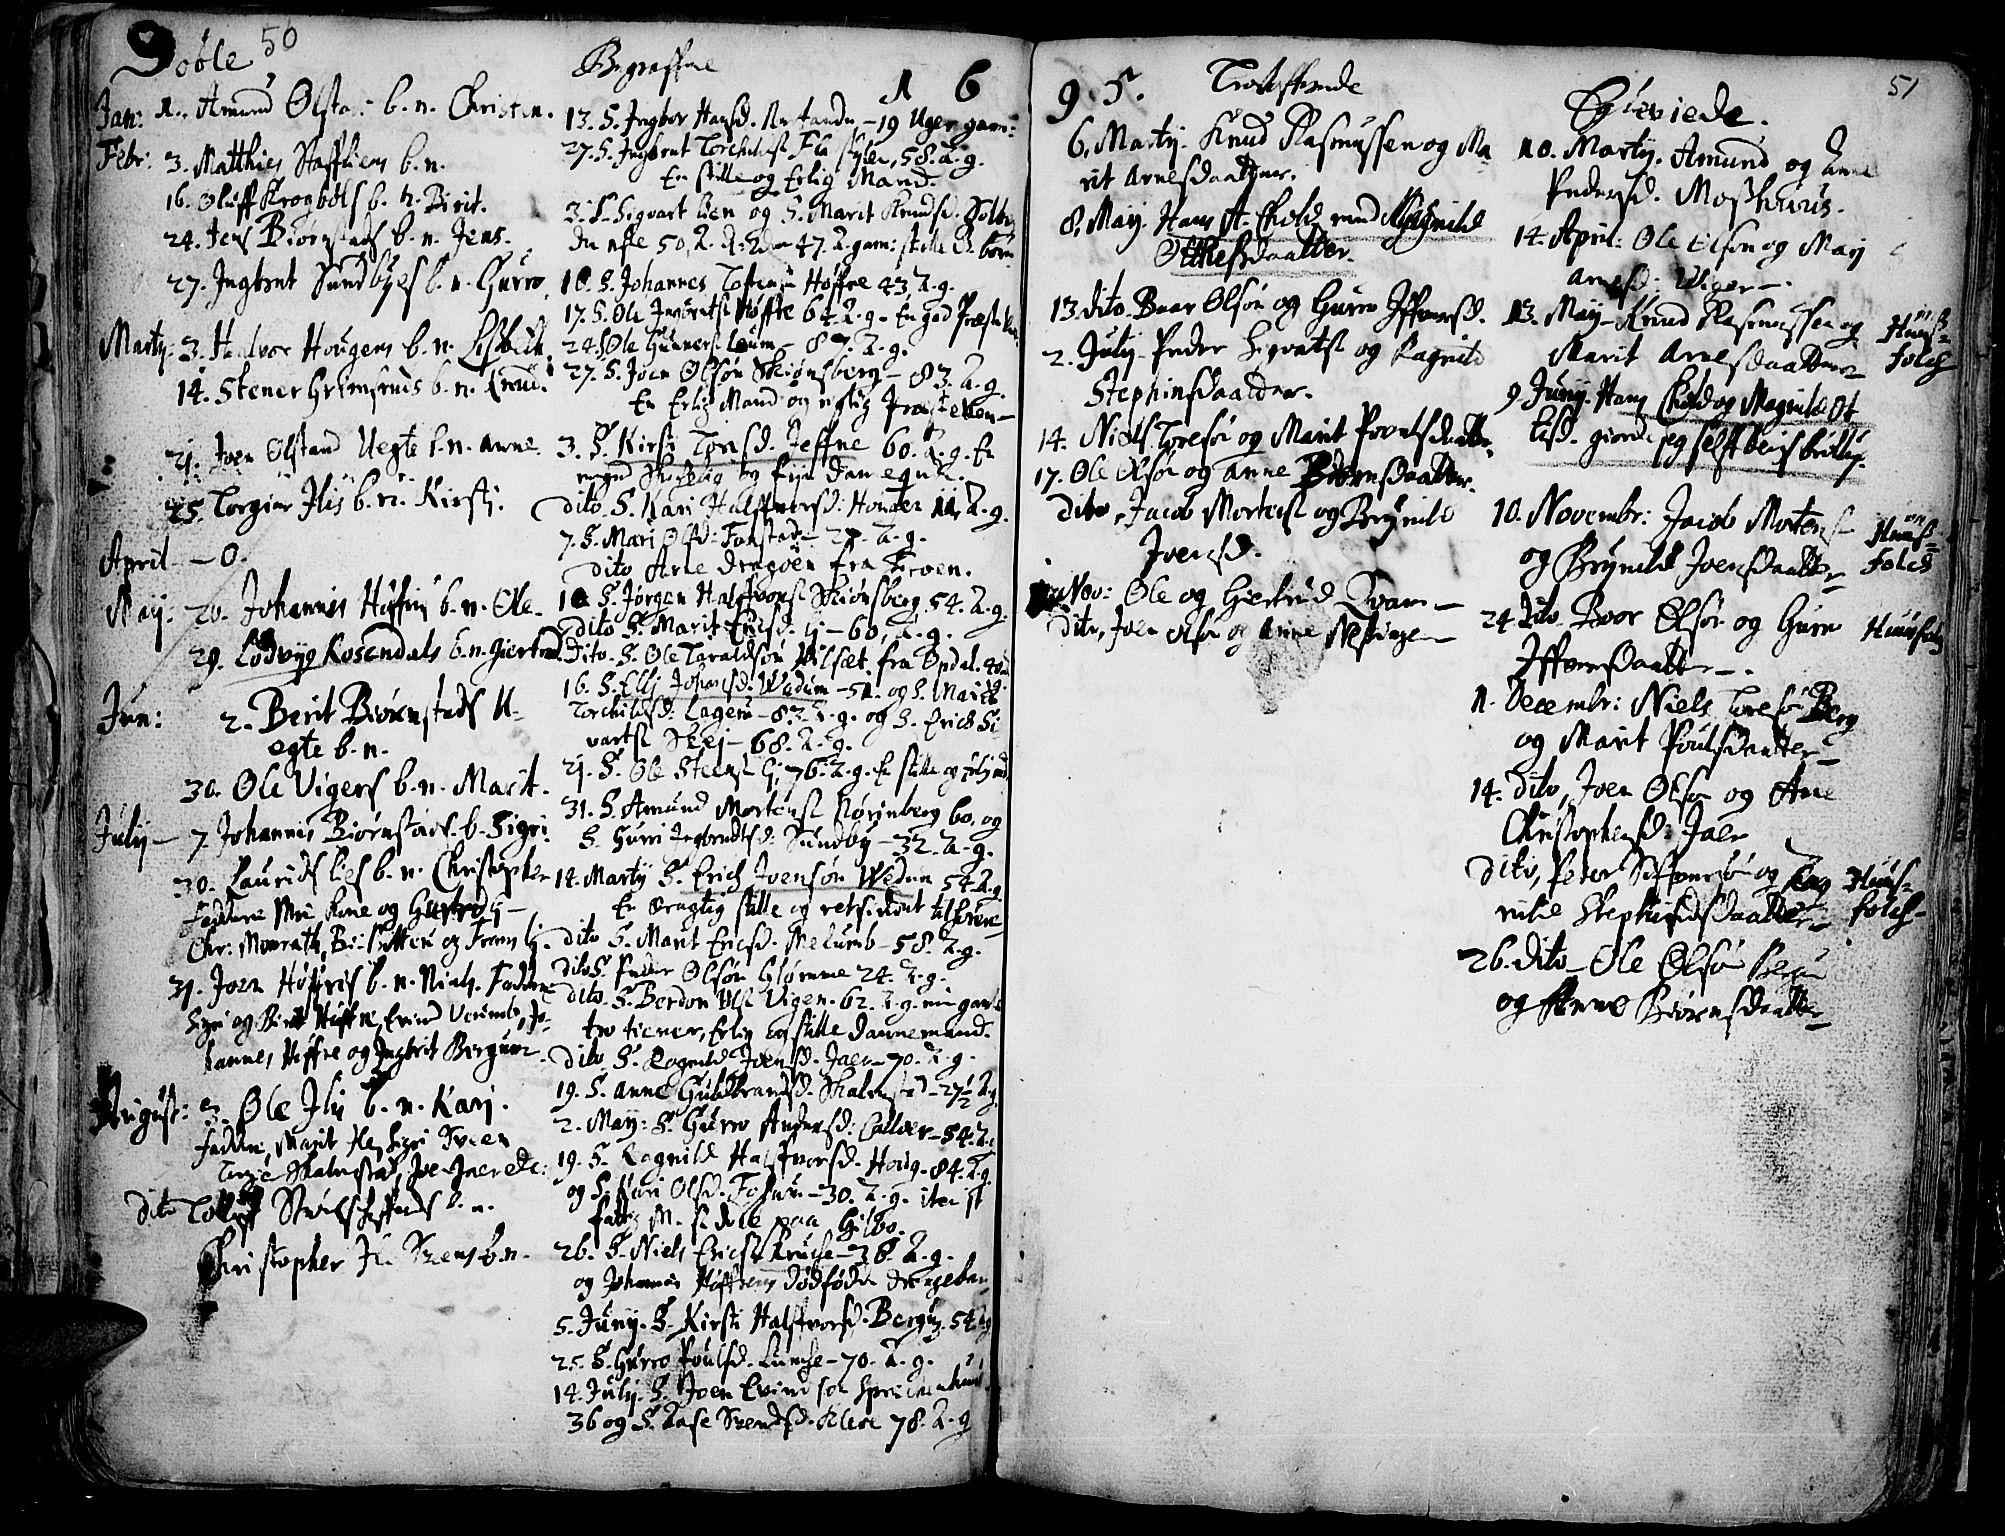 SAH, Øyer prestekontor, Ministerialbok nr. 1, 1671-1727, s. 50-51